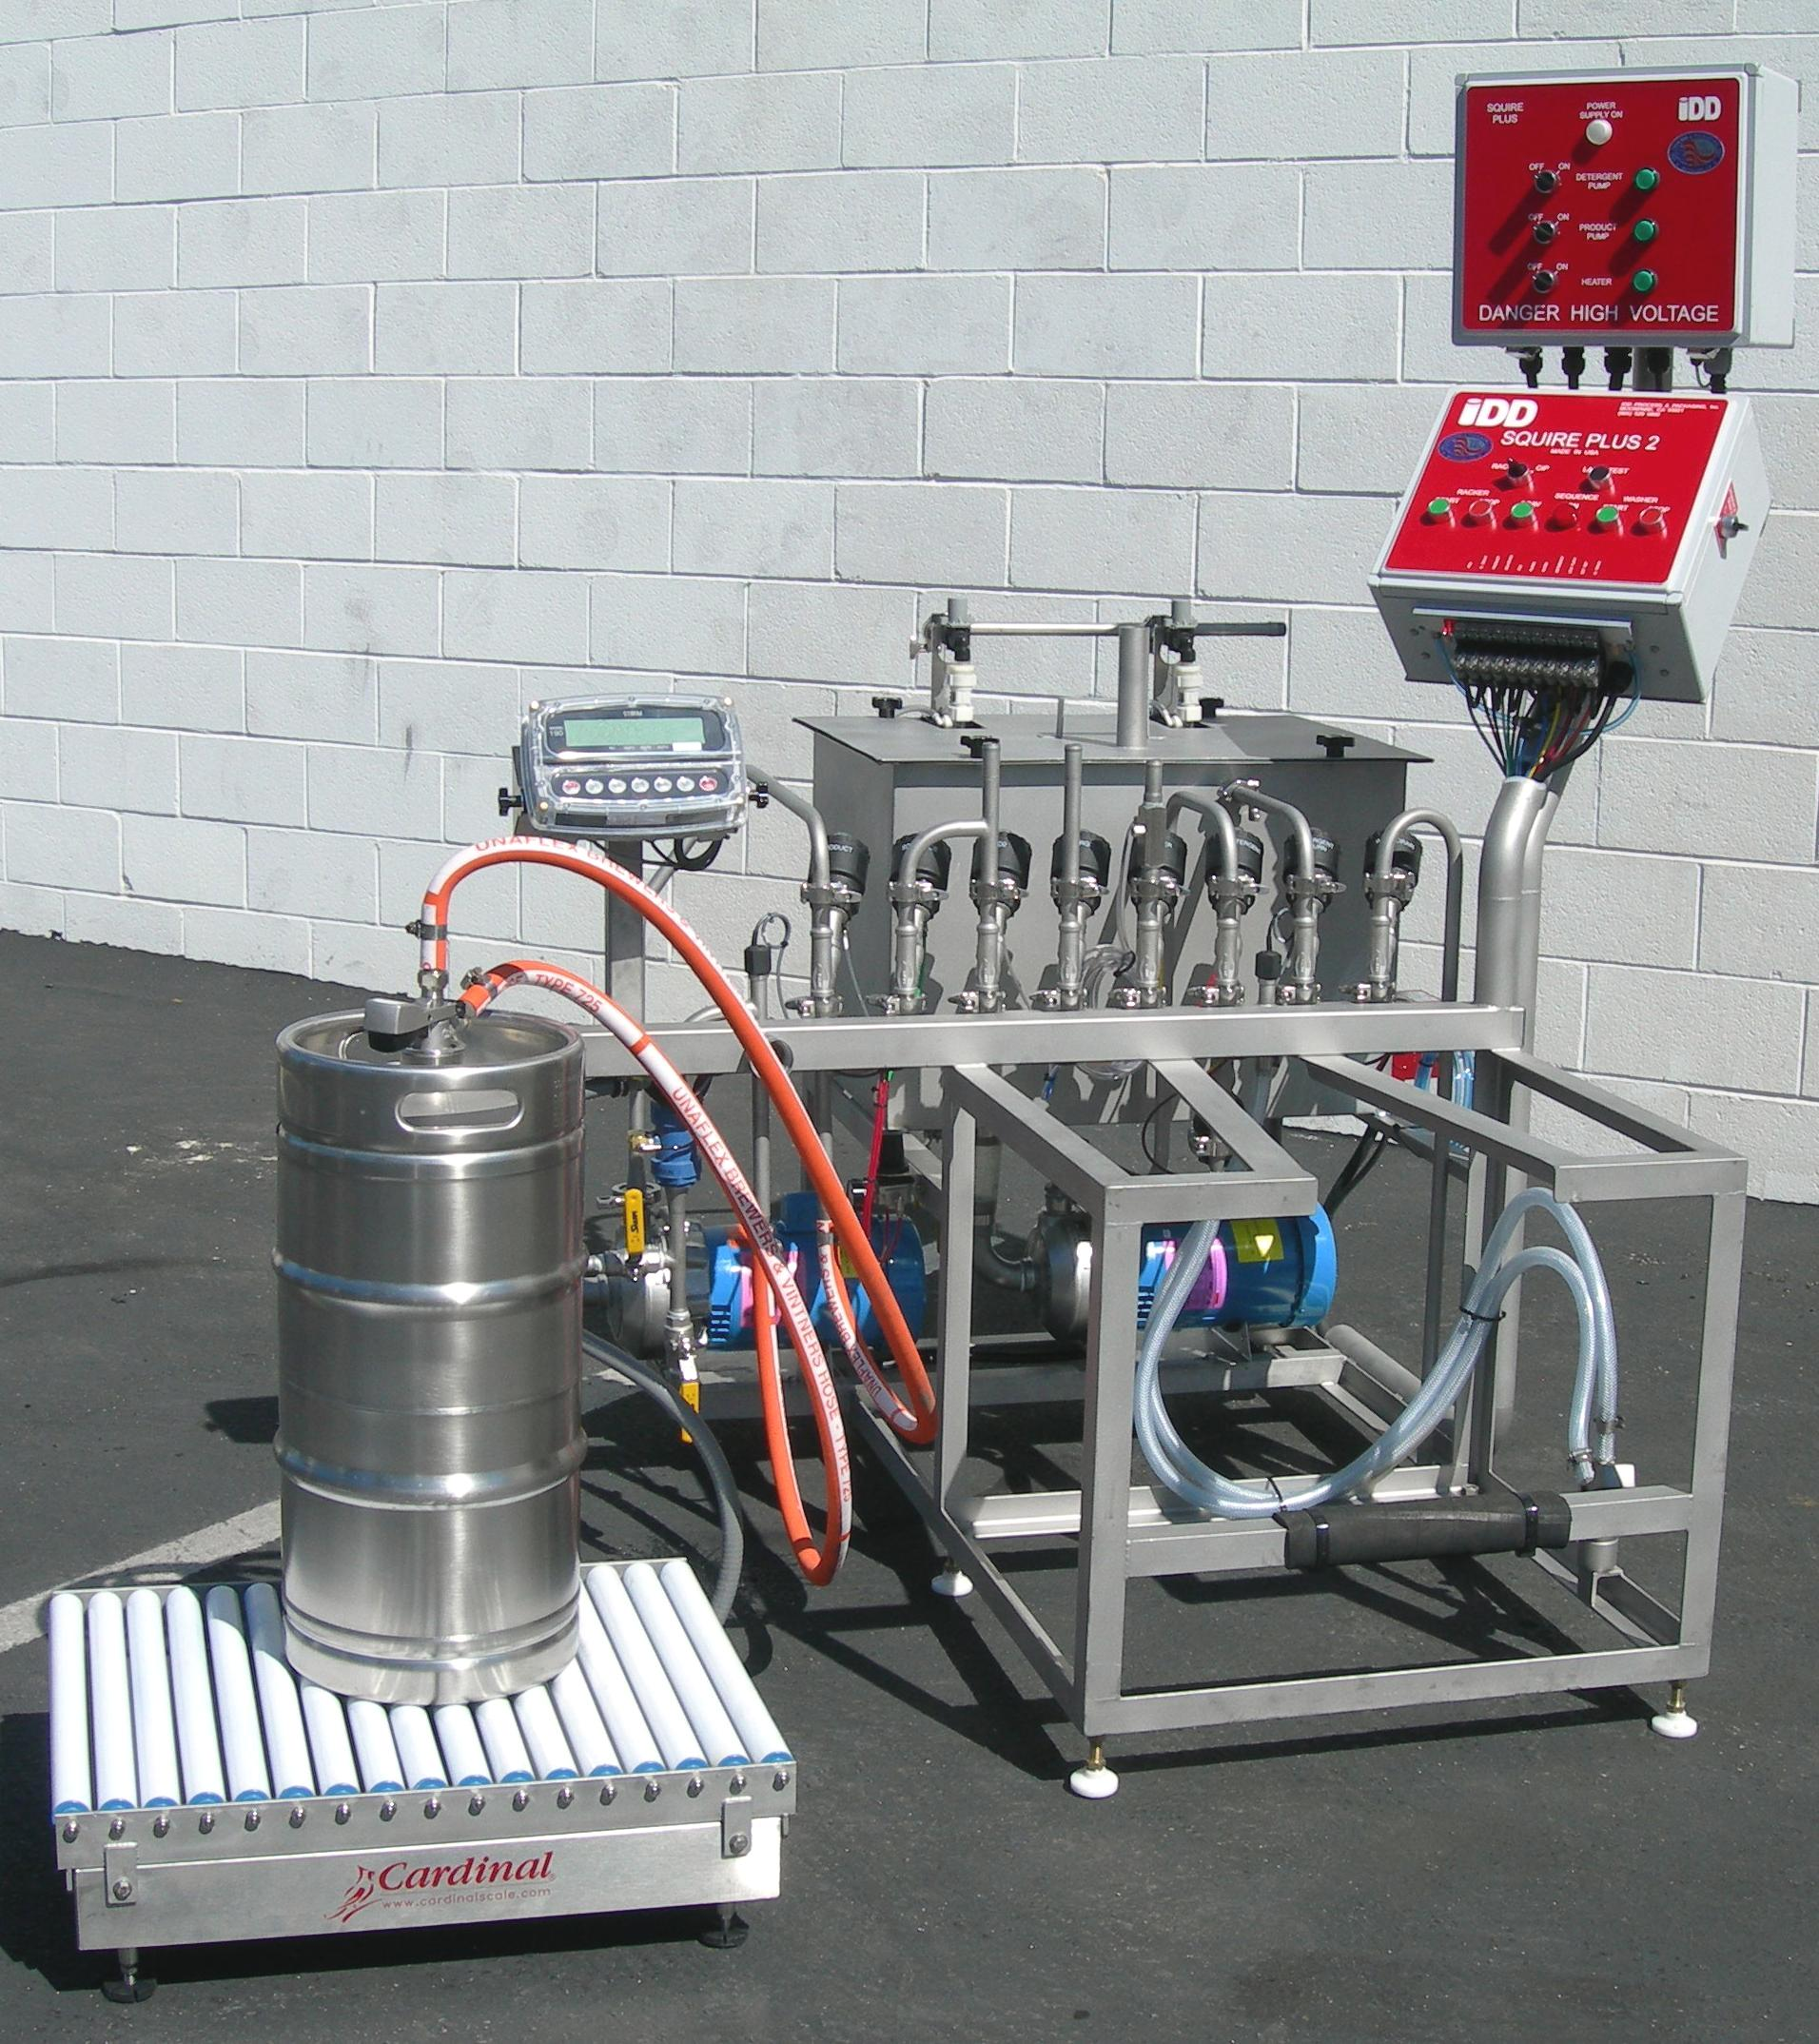 Squire Plus 2 - Keg Washing, Sanitizing, and FillingUp to 30 Kegs per Hour